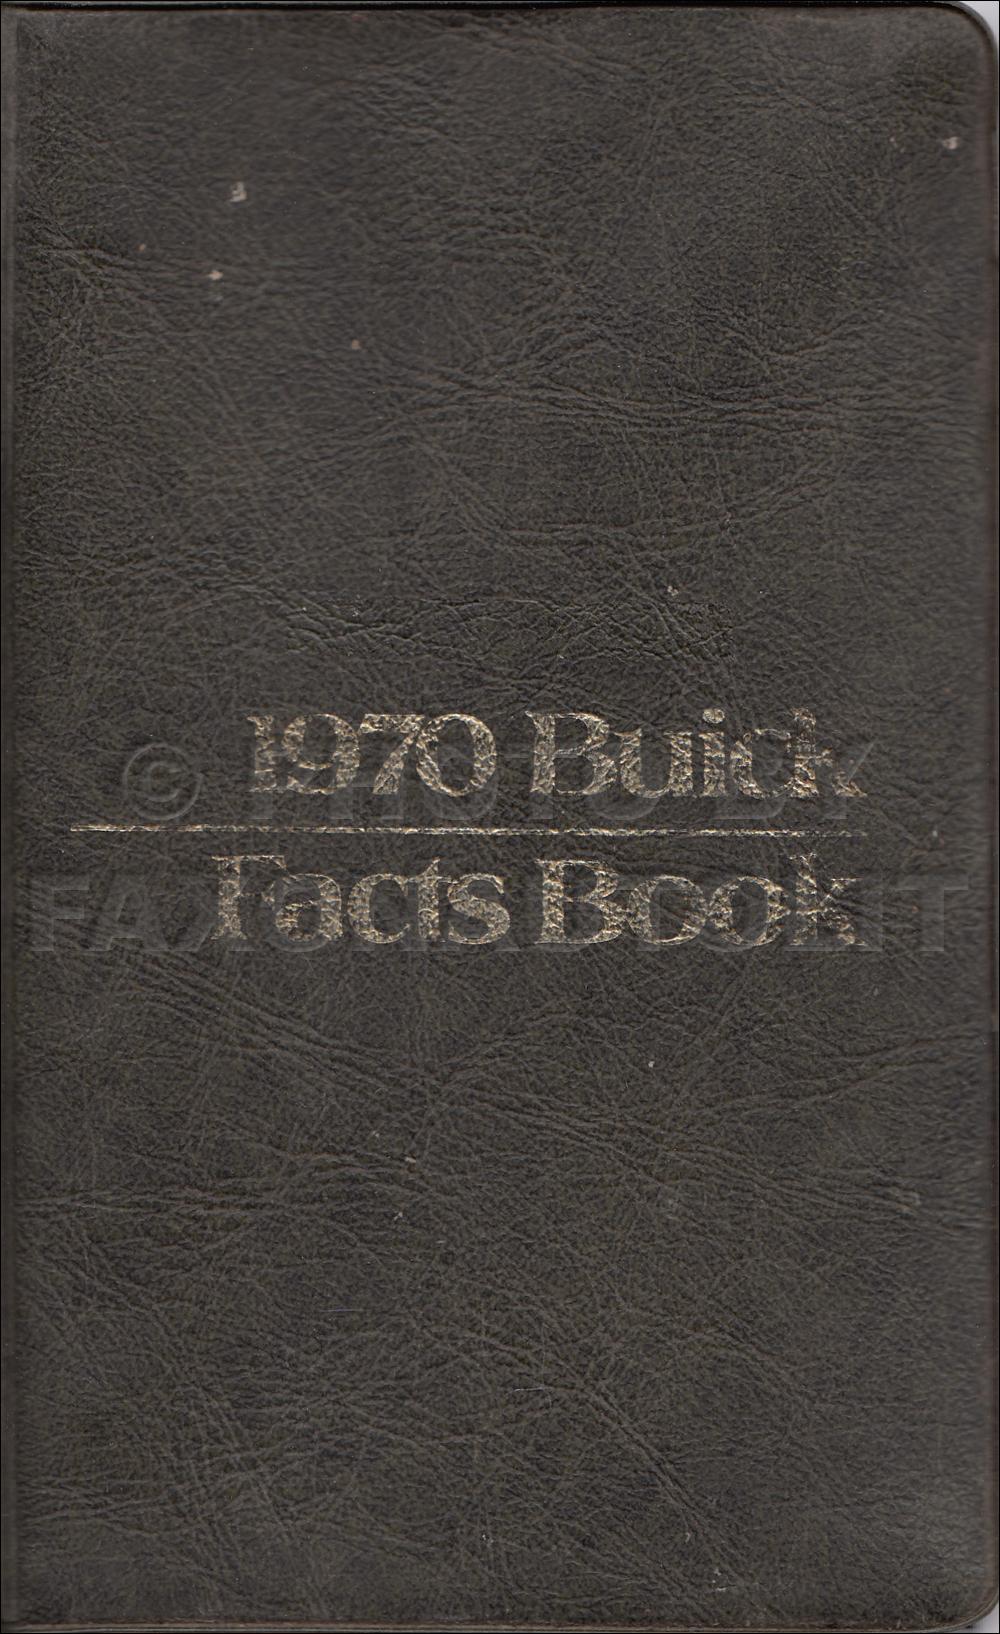 Search 1968 1969 70 71 72 Buick Skylark Gs Gsx Electra Lesabre Wiring 1970 Facts Book Original